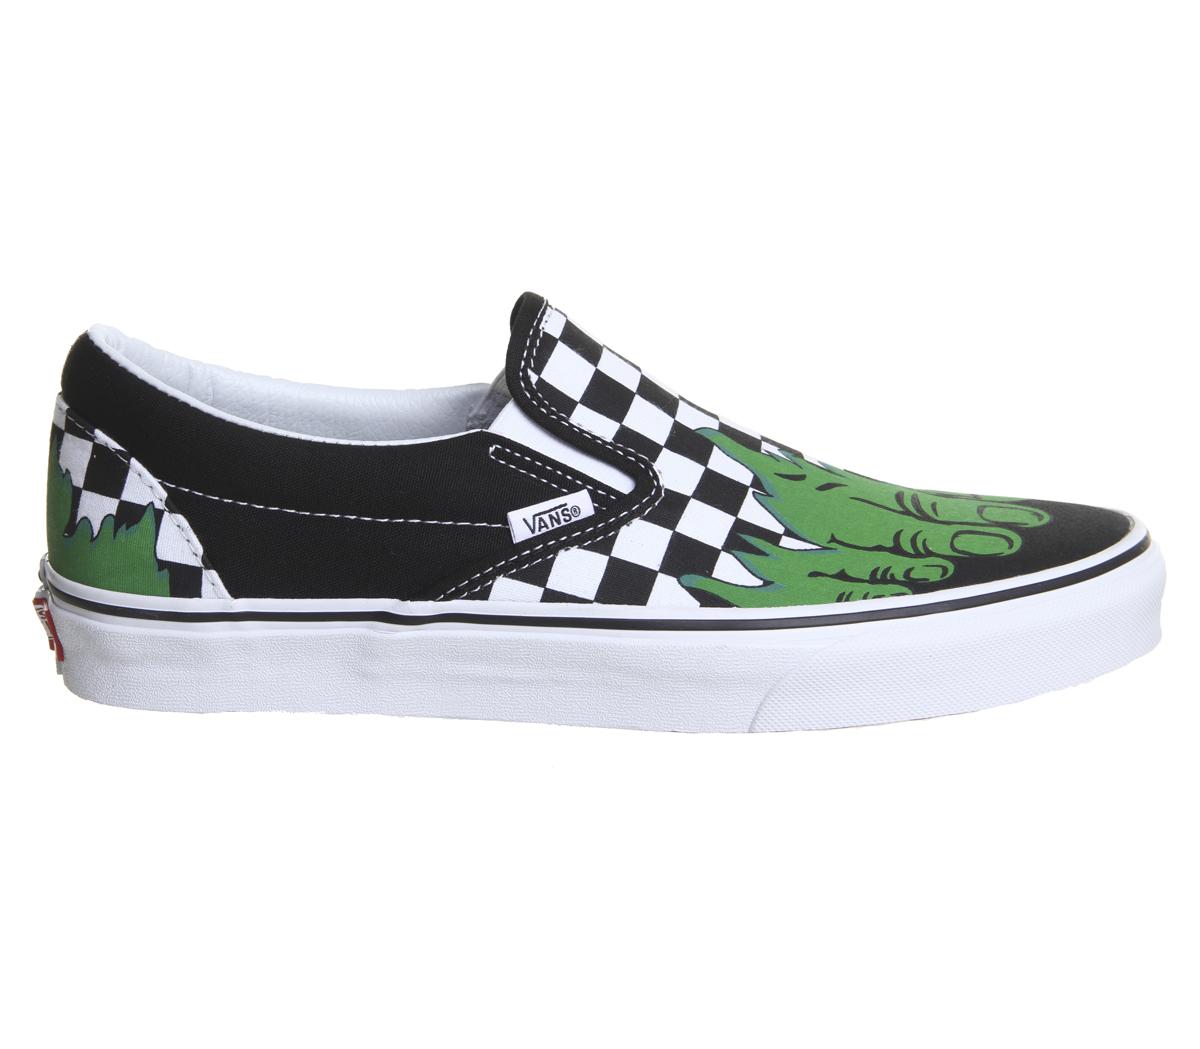 ... Para mujer Vans Vans Clásico Slip Ons Hulk de tablero de Ajedrez de  Marvel Tenis Zapatos ... 6d8bd4ee58c